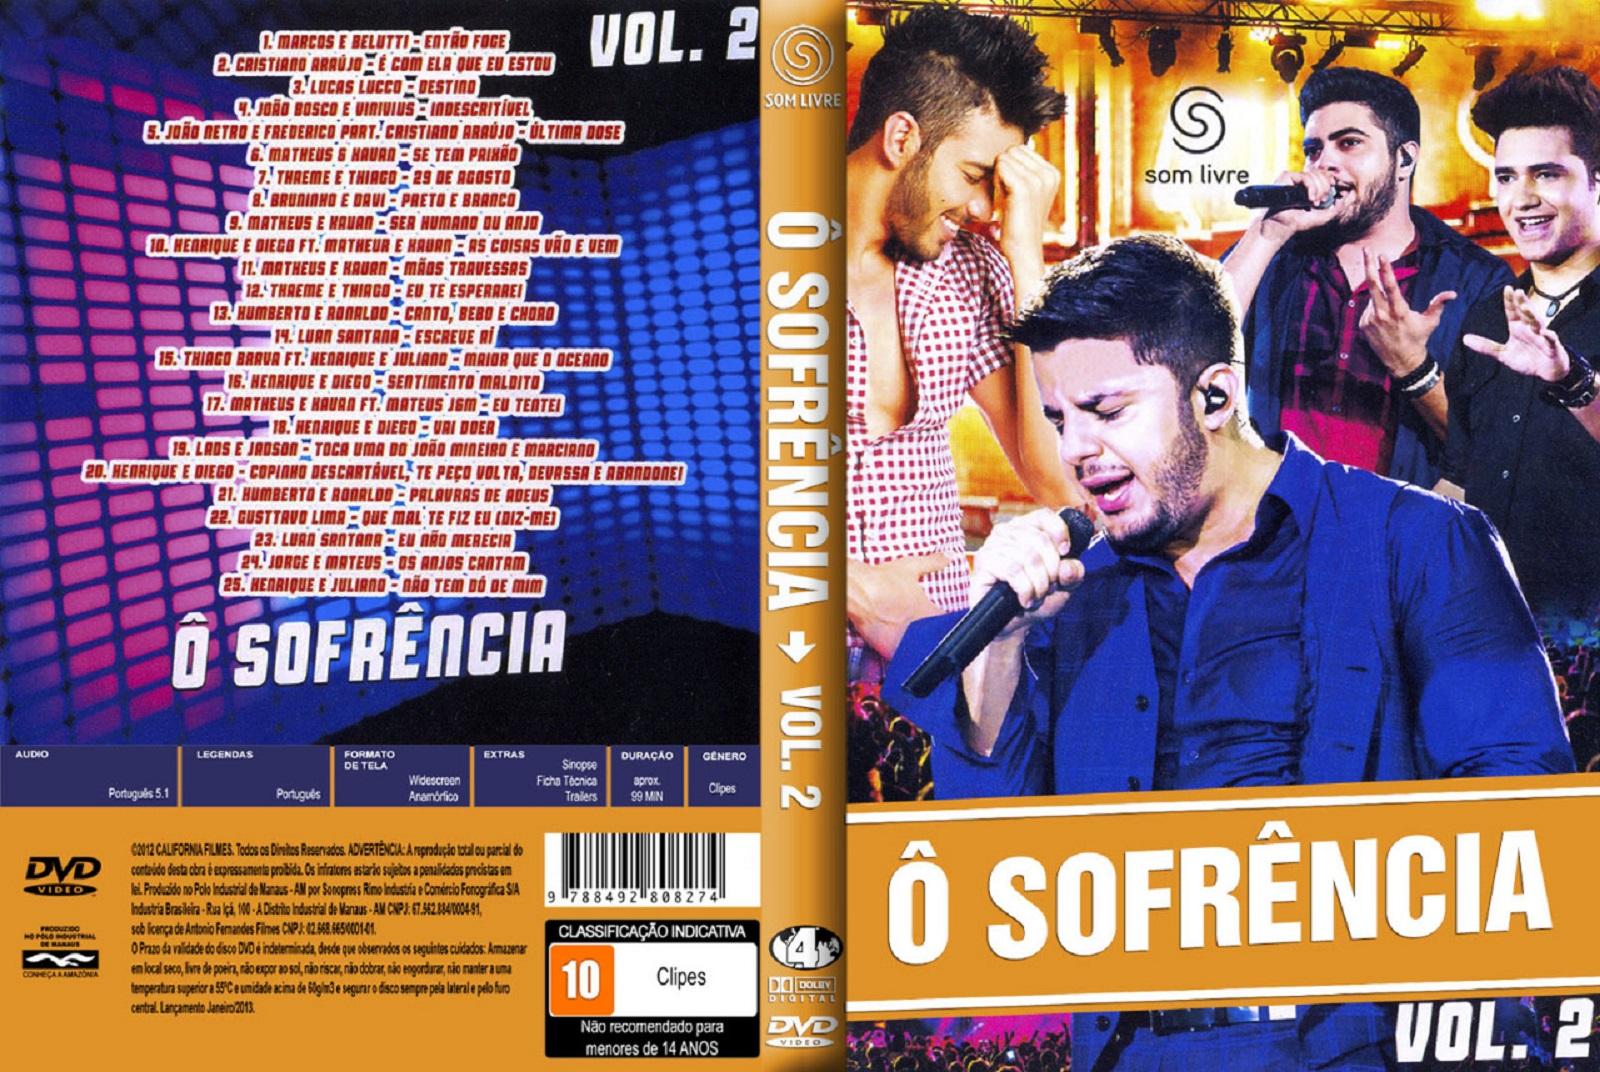 Baixar O Sofrencia Vol.2 DVD-R  25C3 2594 2Bsofr 25C3 25AAncia 2BVol 2B2 2B 25281 2529